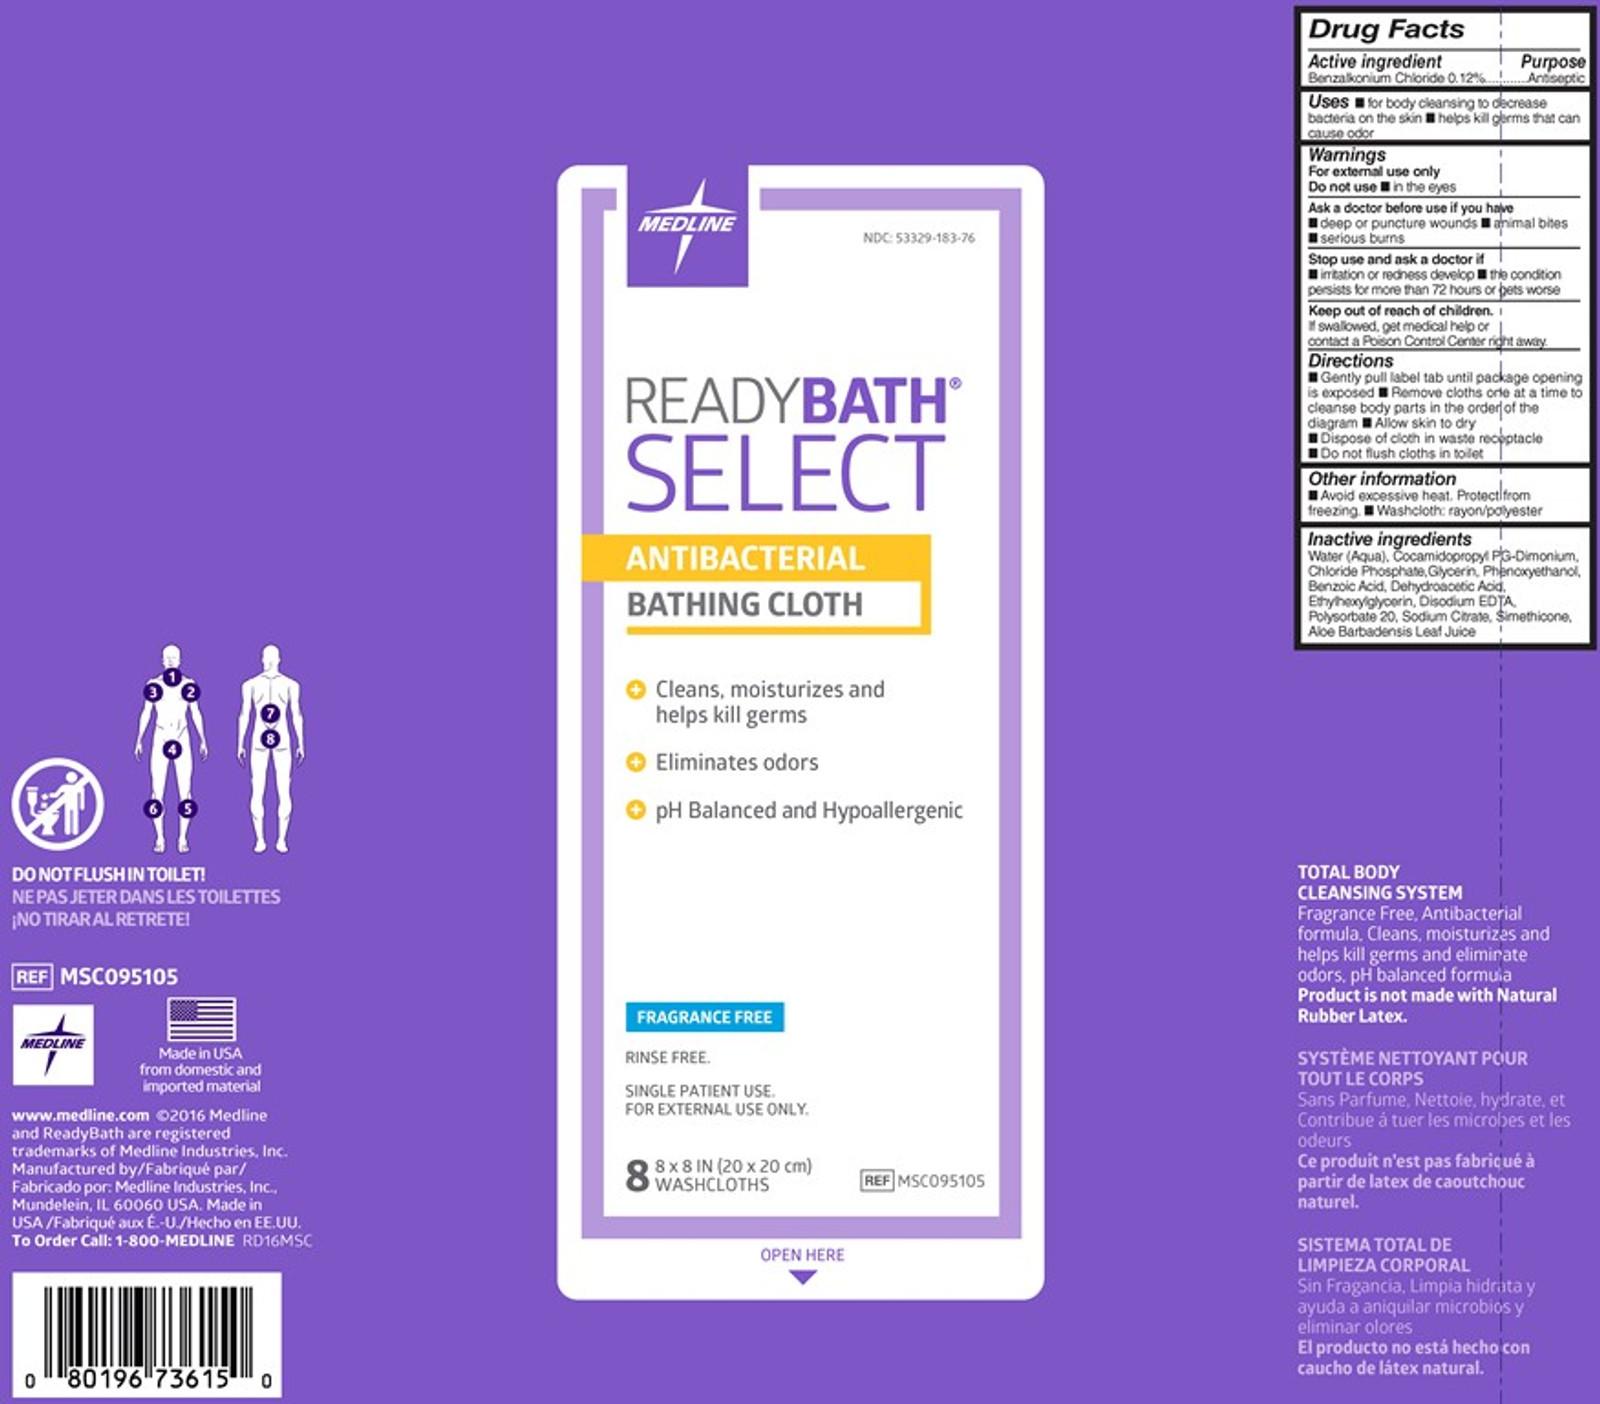 ReadyBath SELECT Medium-Weight Antibacterial Bathing Cloths Un-scented